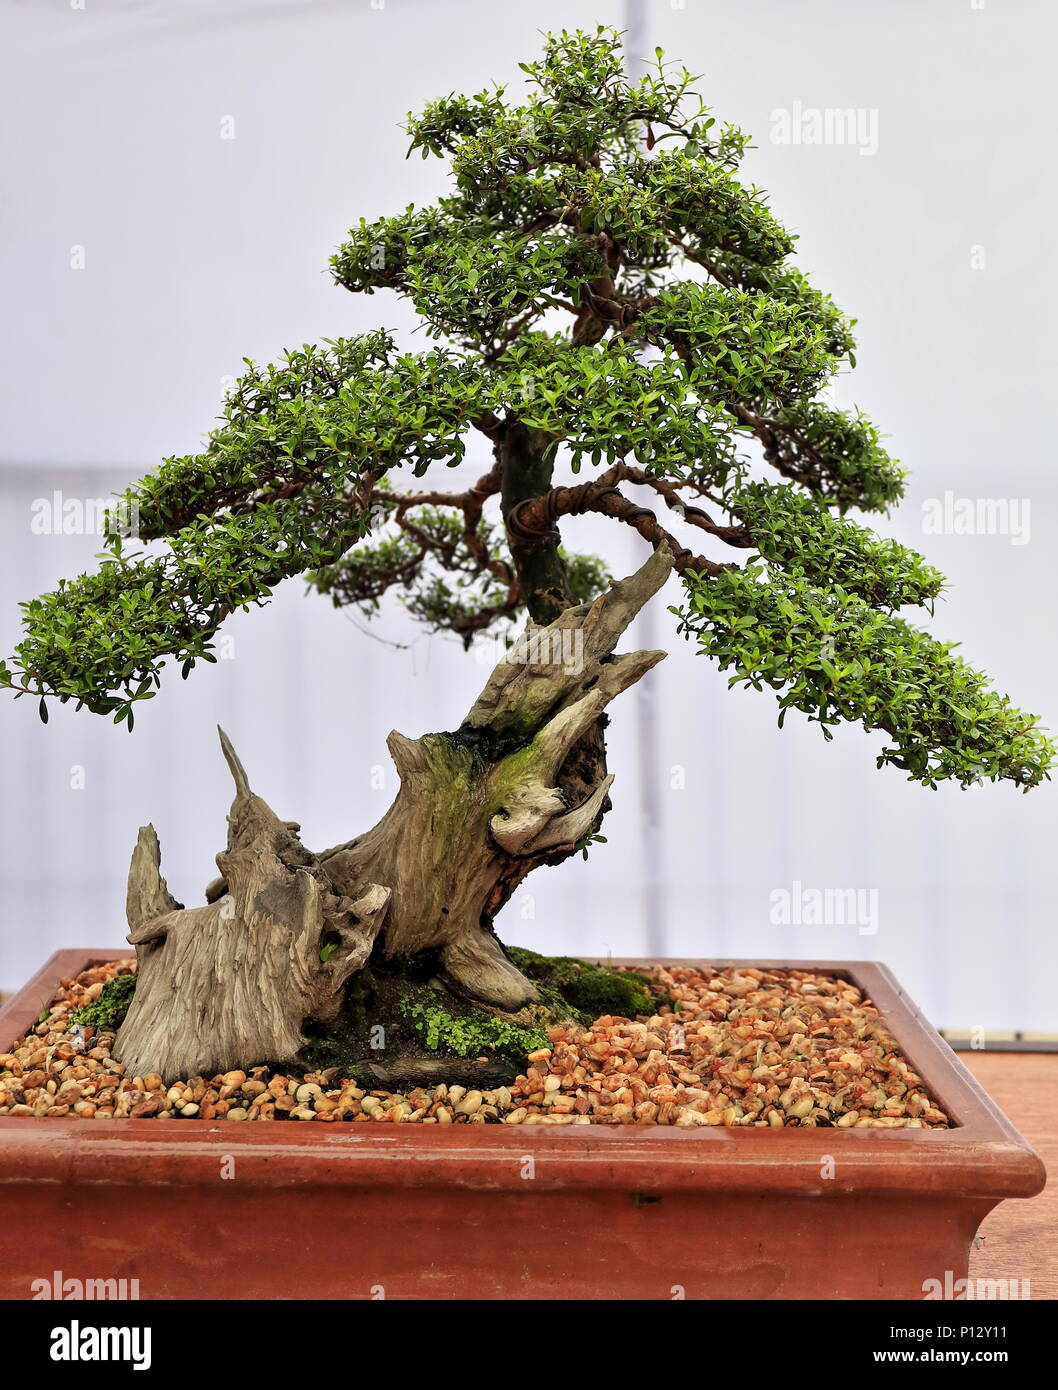 Los Bonsais O Bandeja De Siembra Arte Japones De Cultivar Arboles - Arboles-pequeos